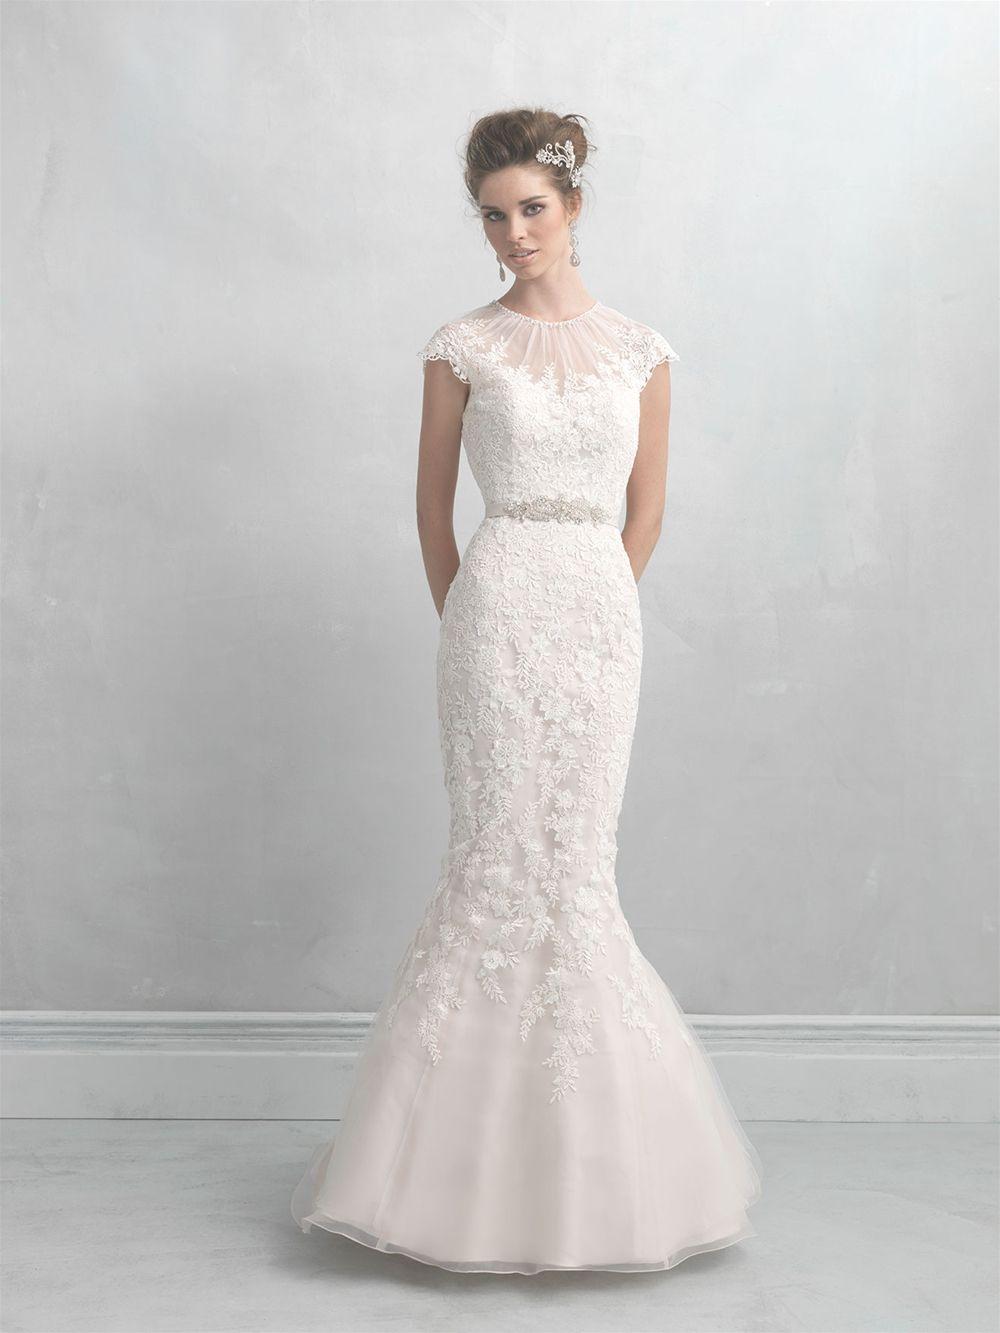 Vintage lace champagne wedding dress  Allure Bridals Style MJ  Bridal  Pinterest  Wedding dresses